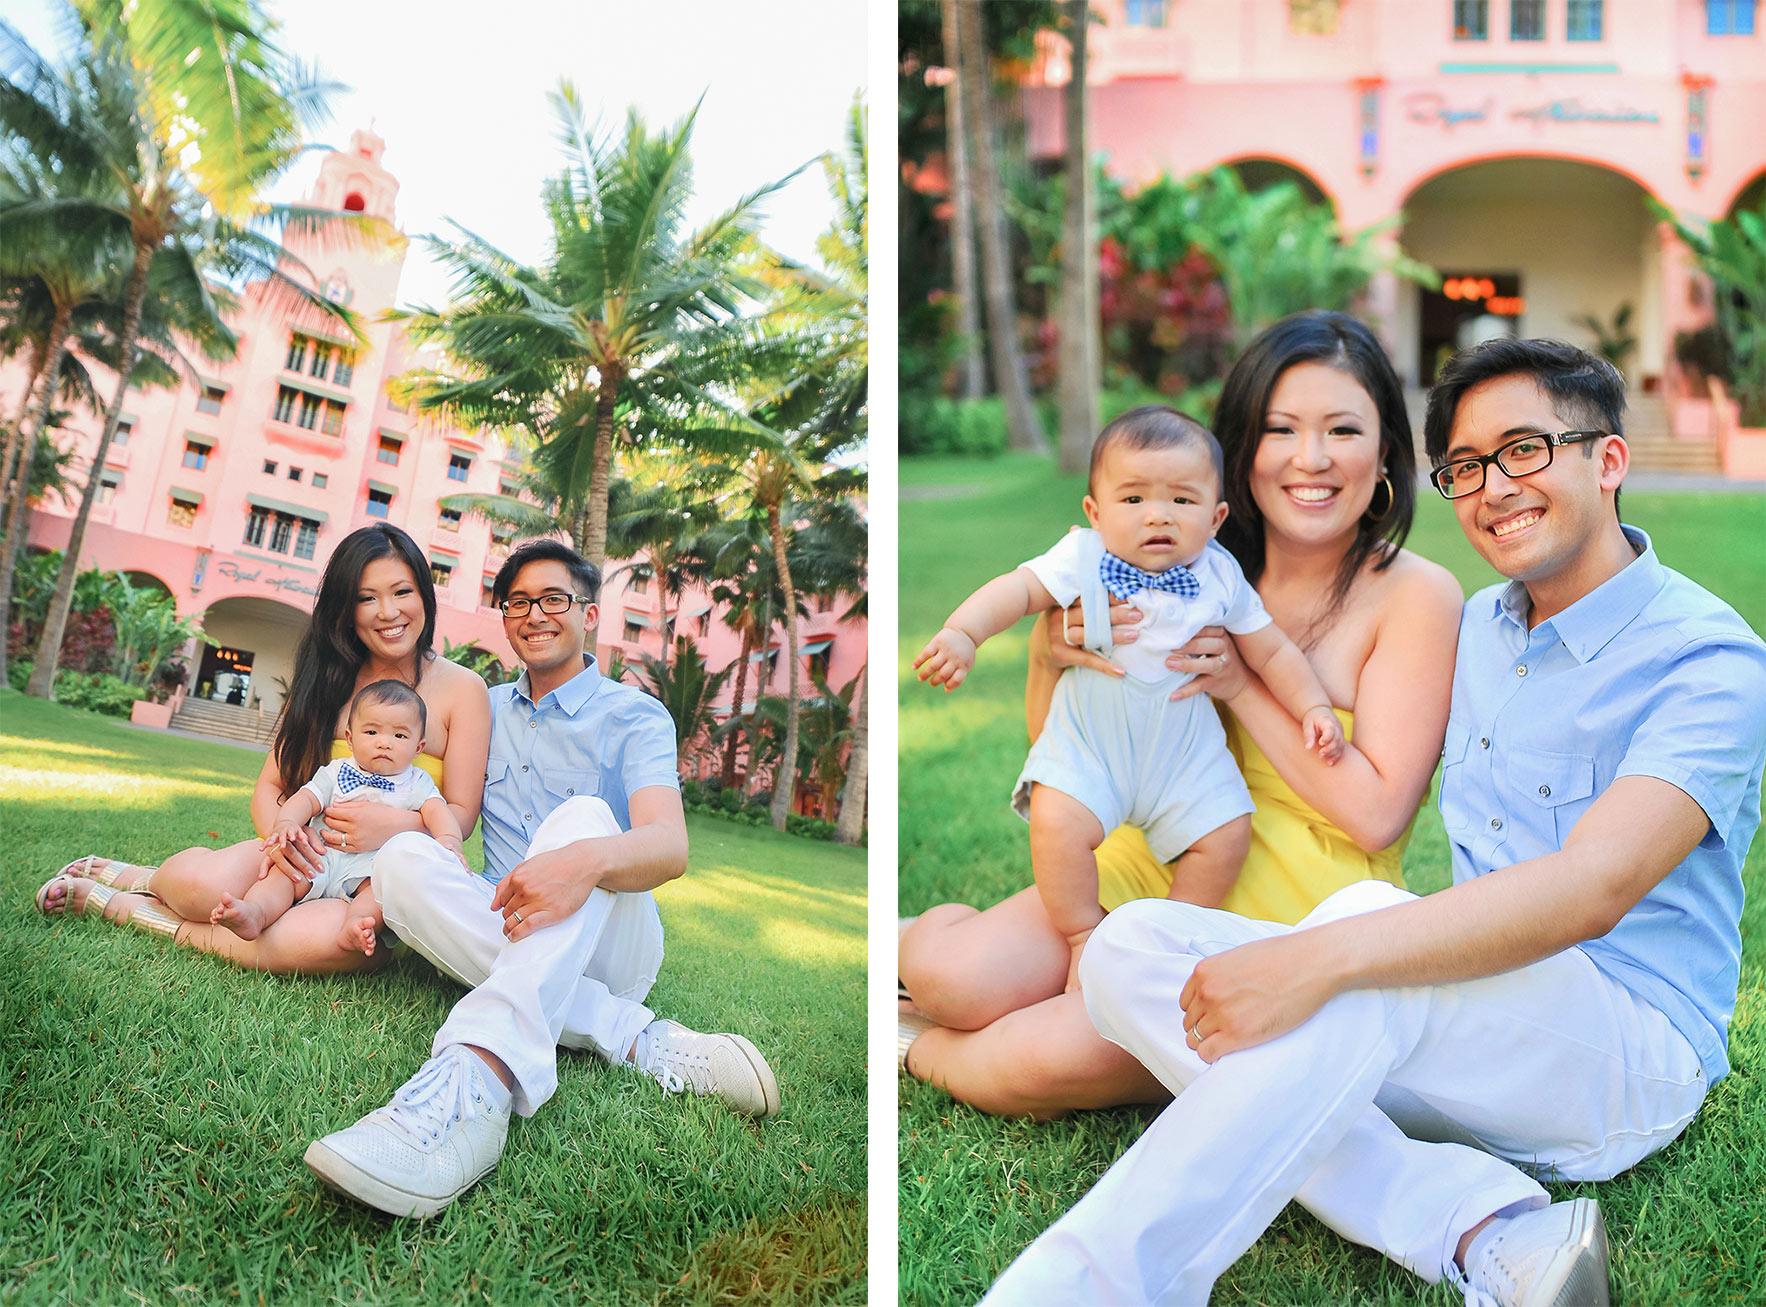 family-photo-oahu-hawaii-waikiki-beach-3-stephen-ludwig.jpg